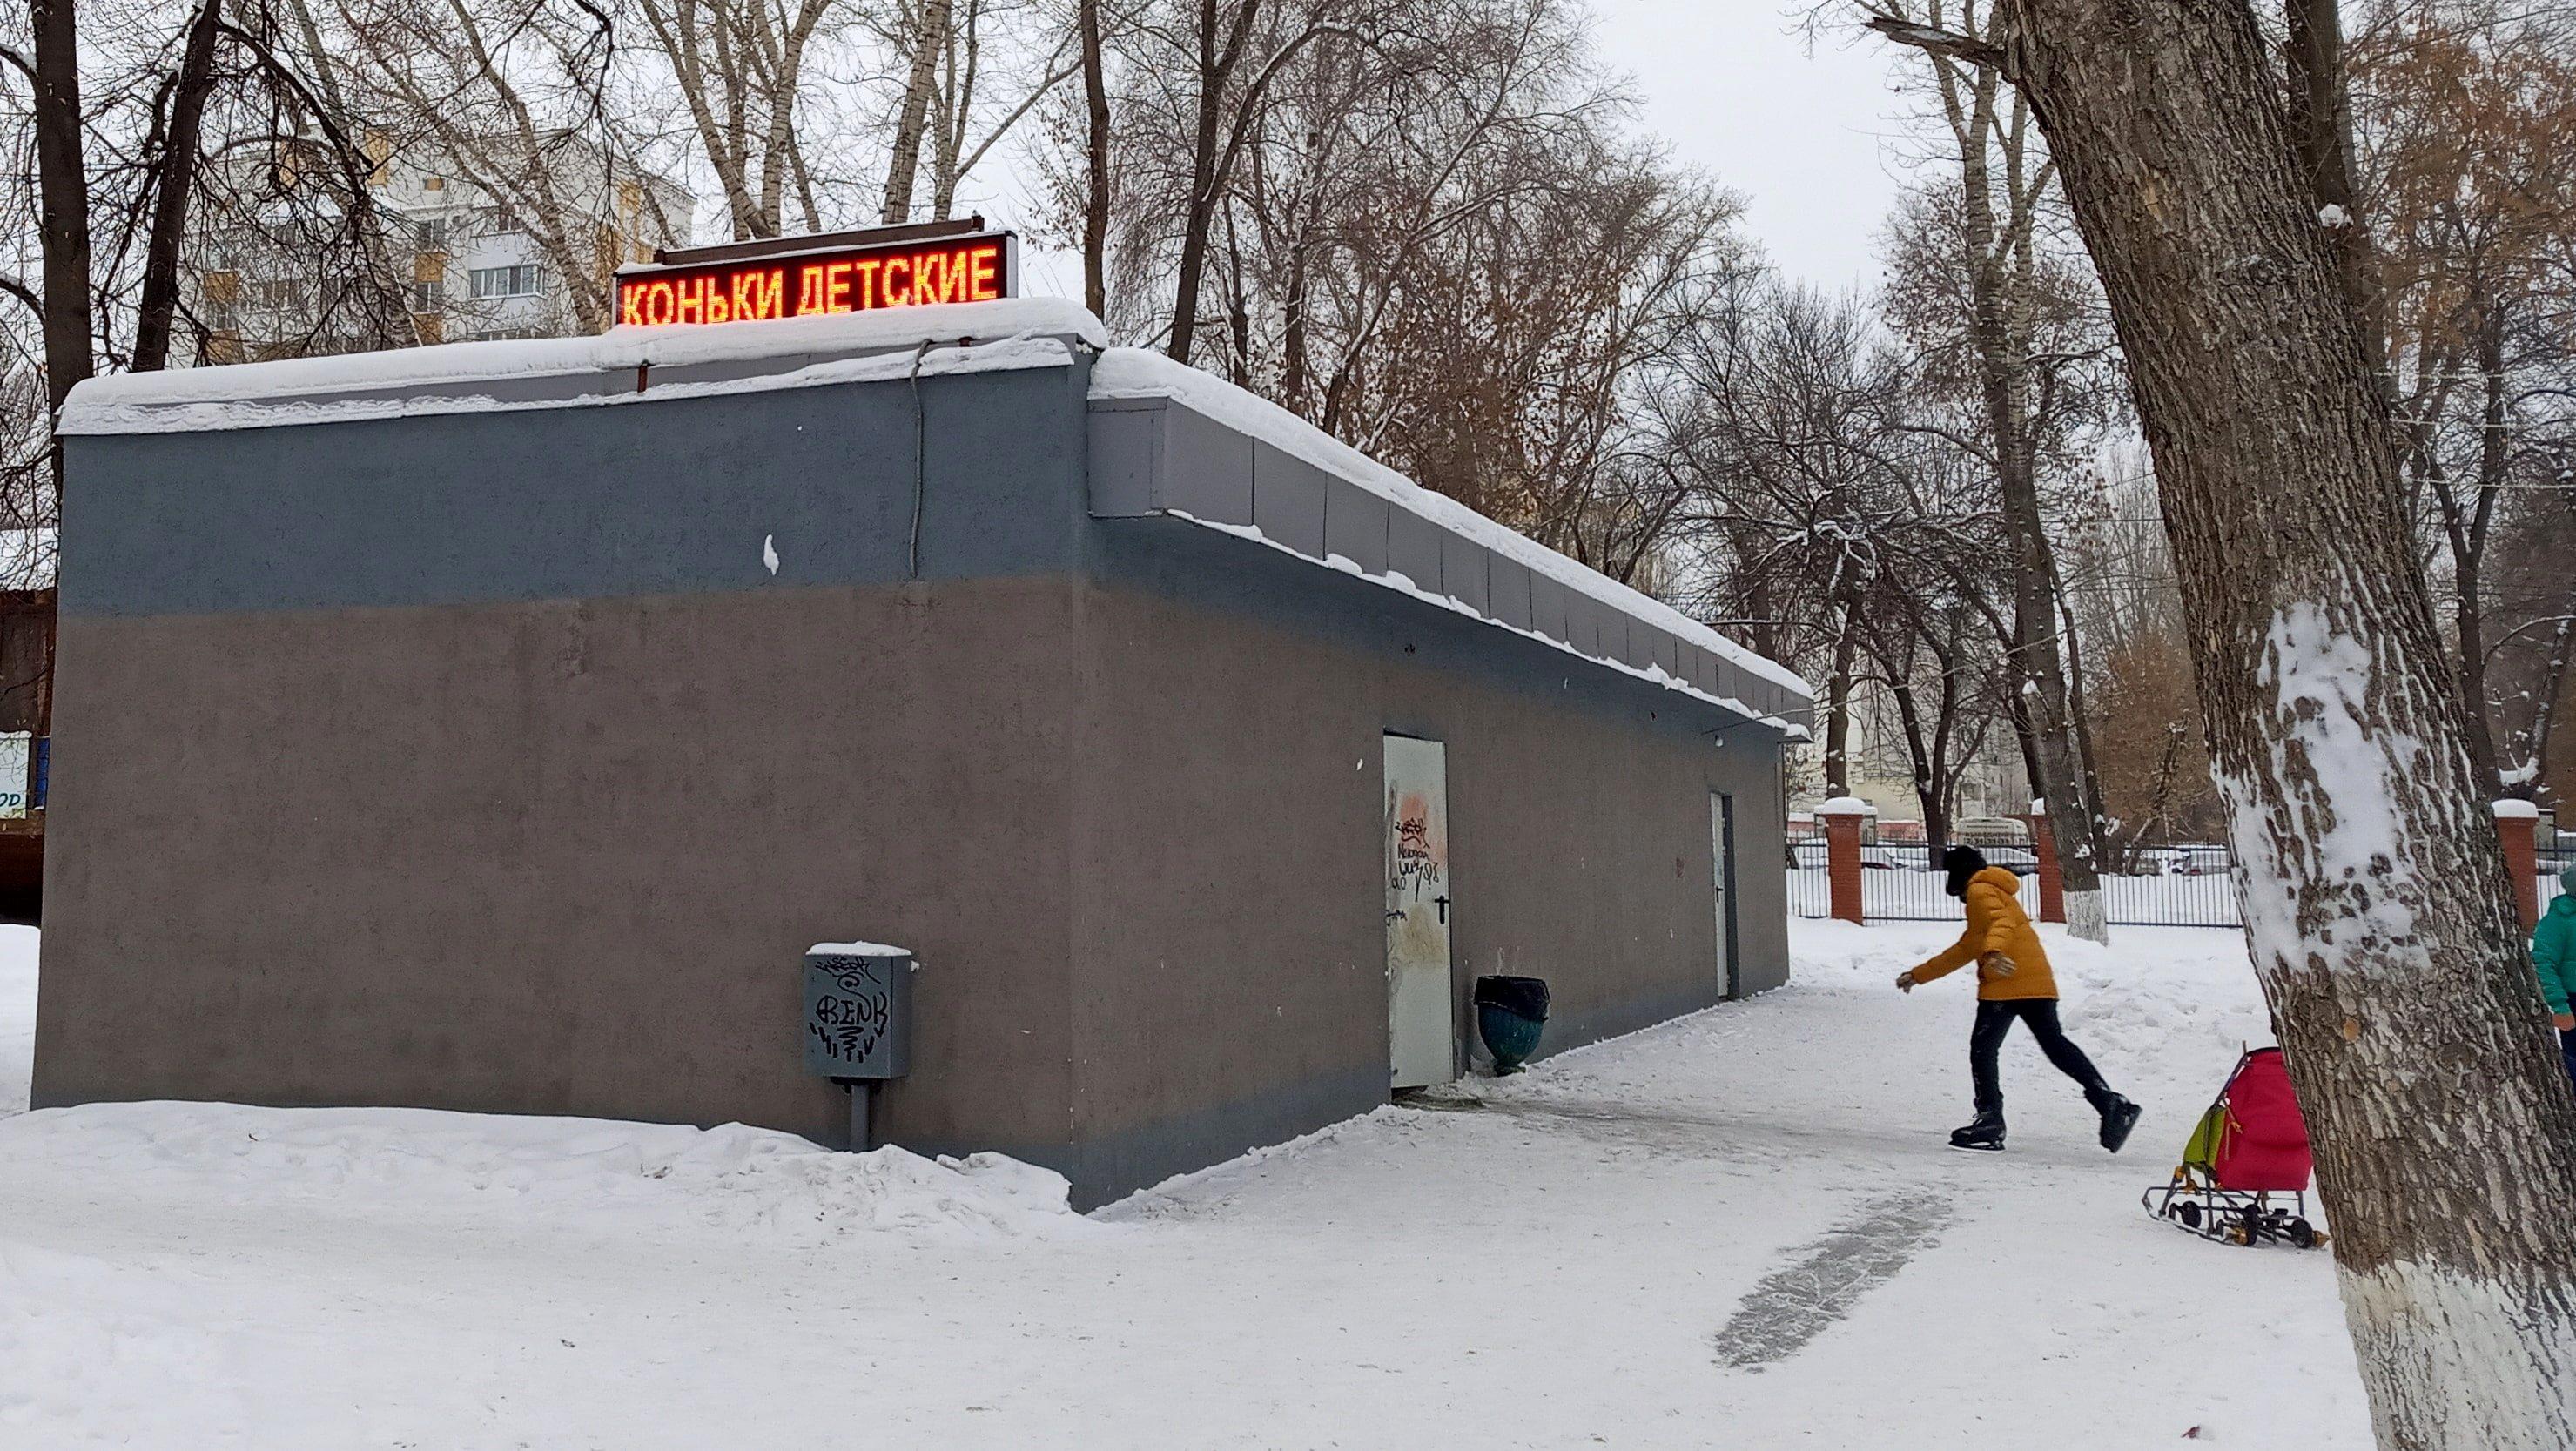 Конькобежная база